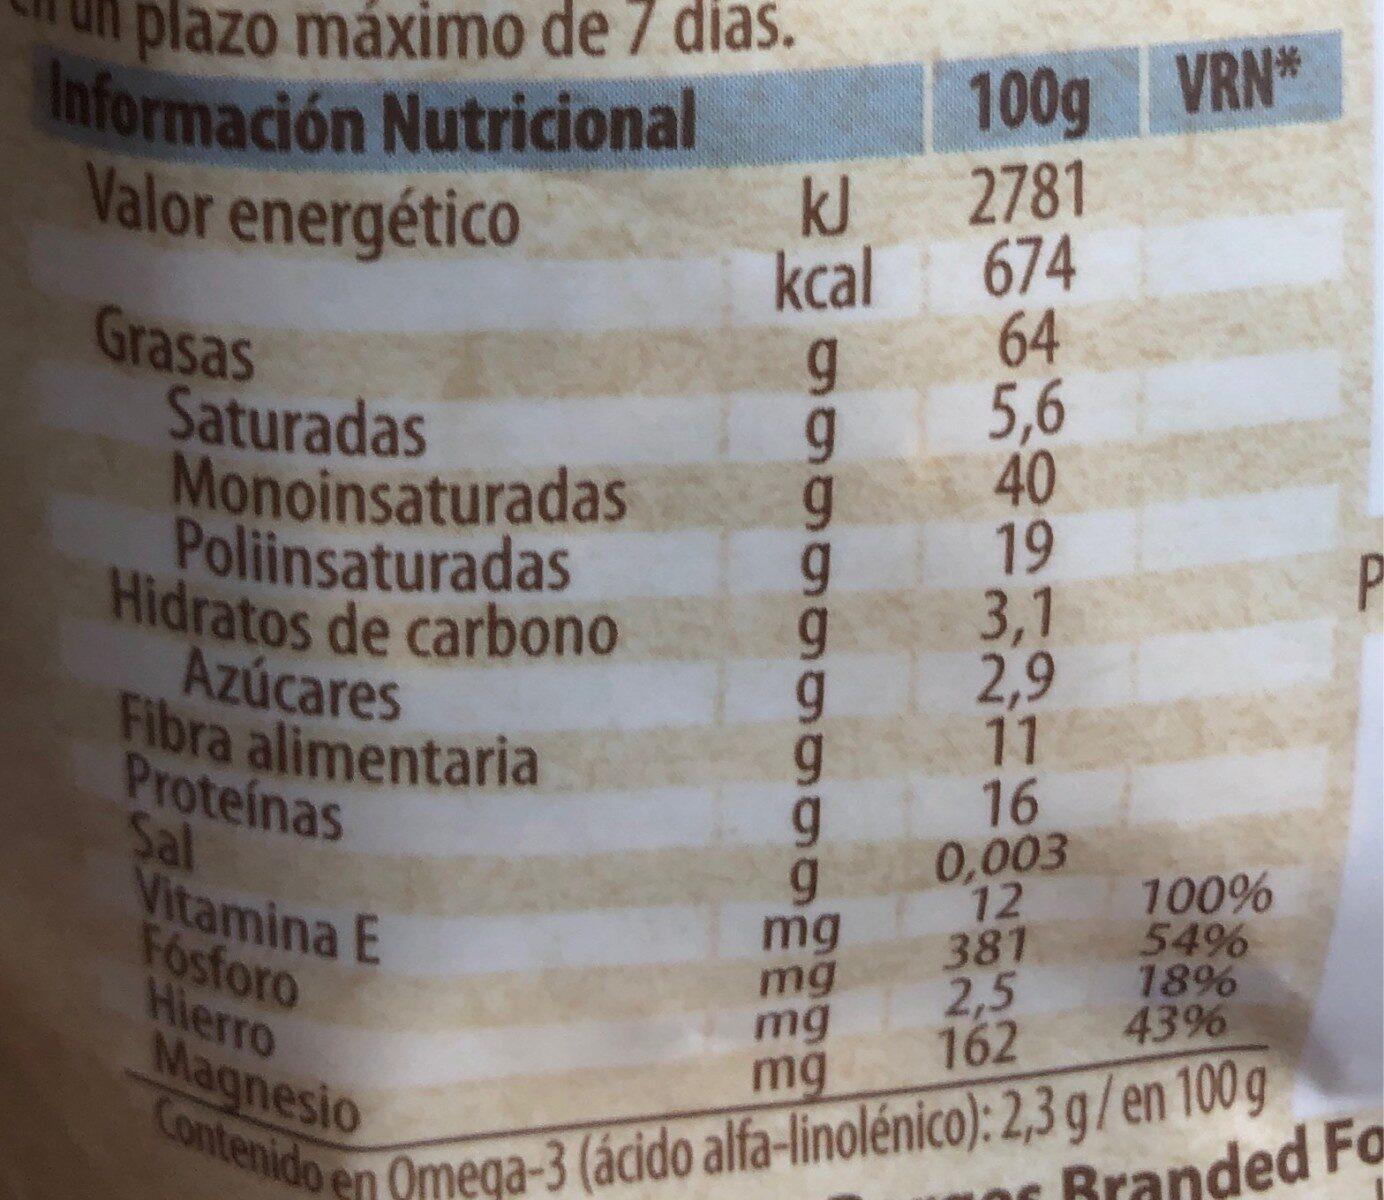 Natura cóctel de frutos secos crudos natural - Informations nutritionnelles